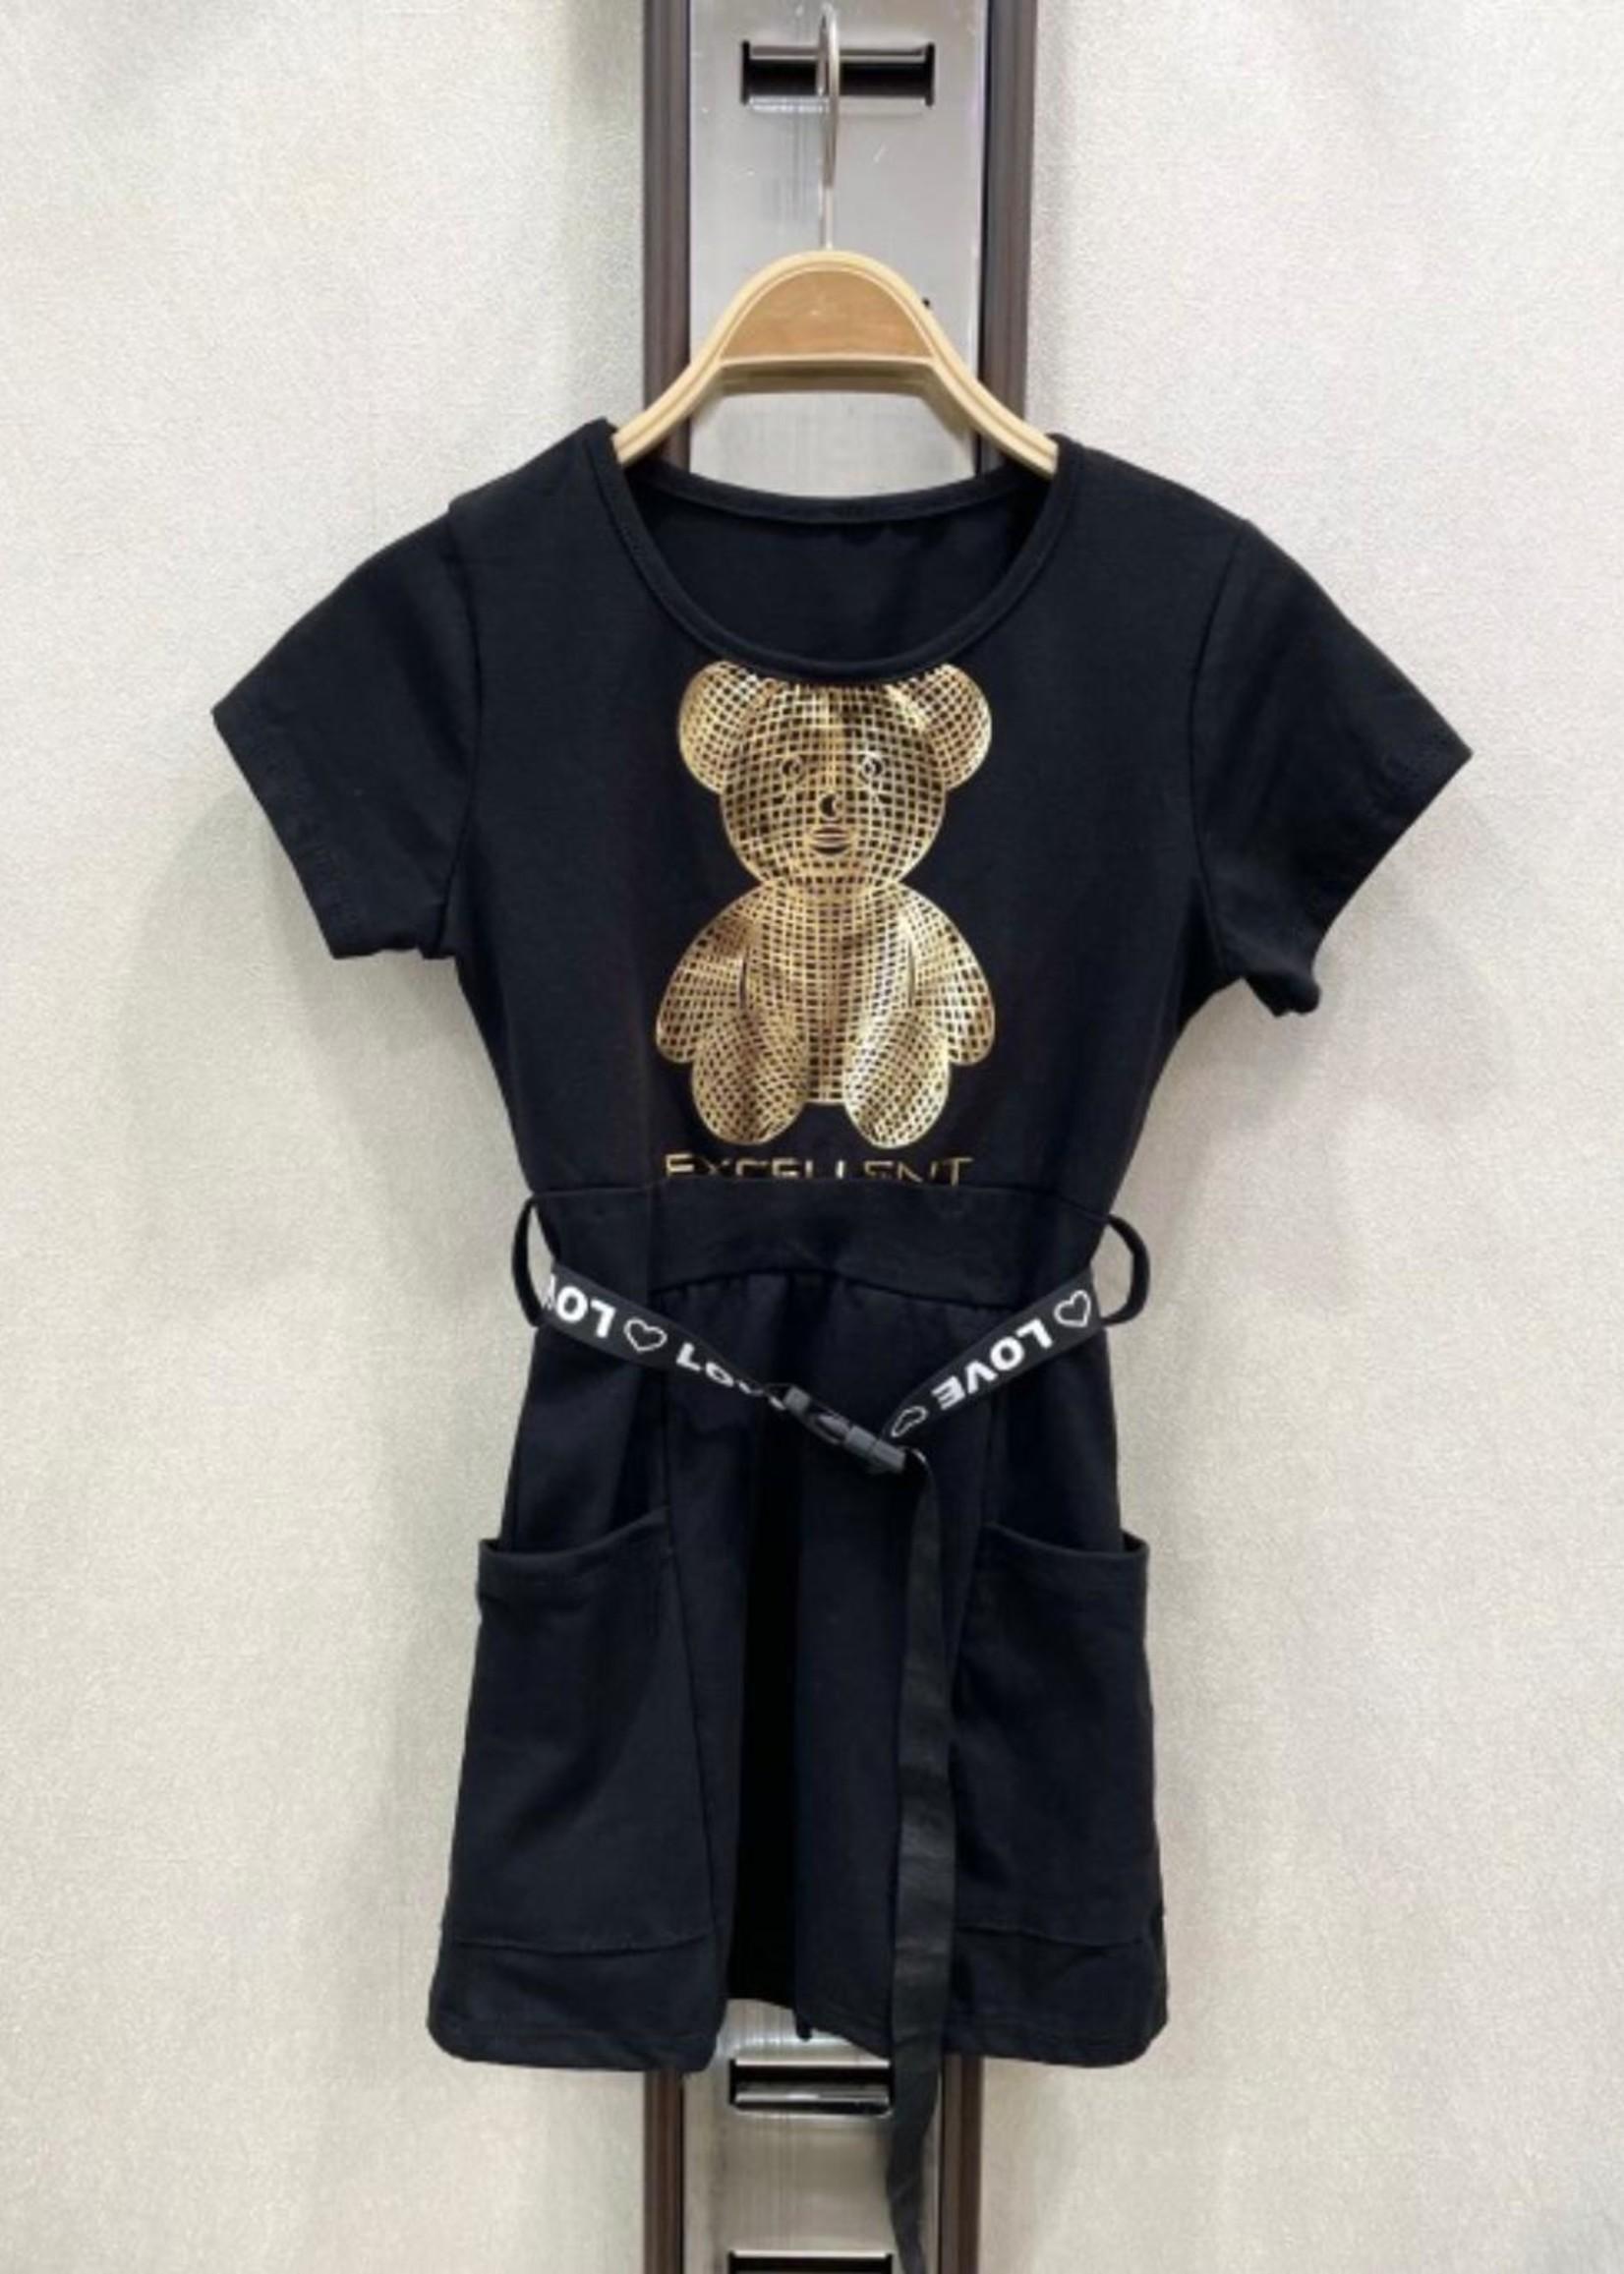 Divanis Divanis bear dress black